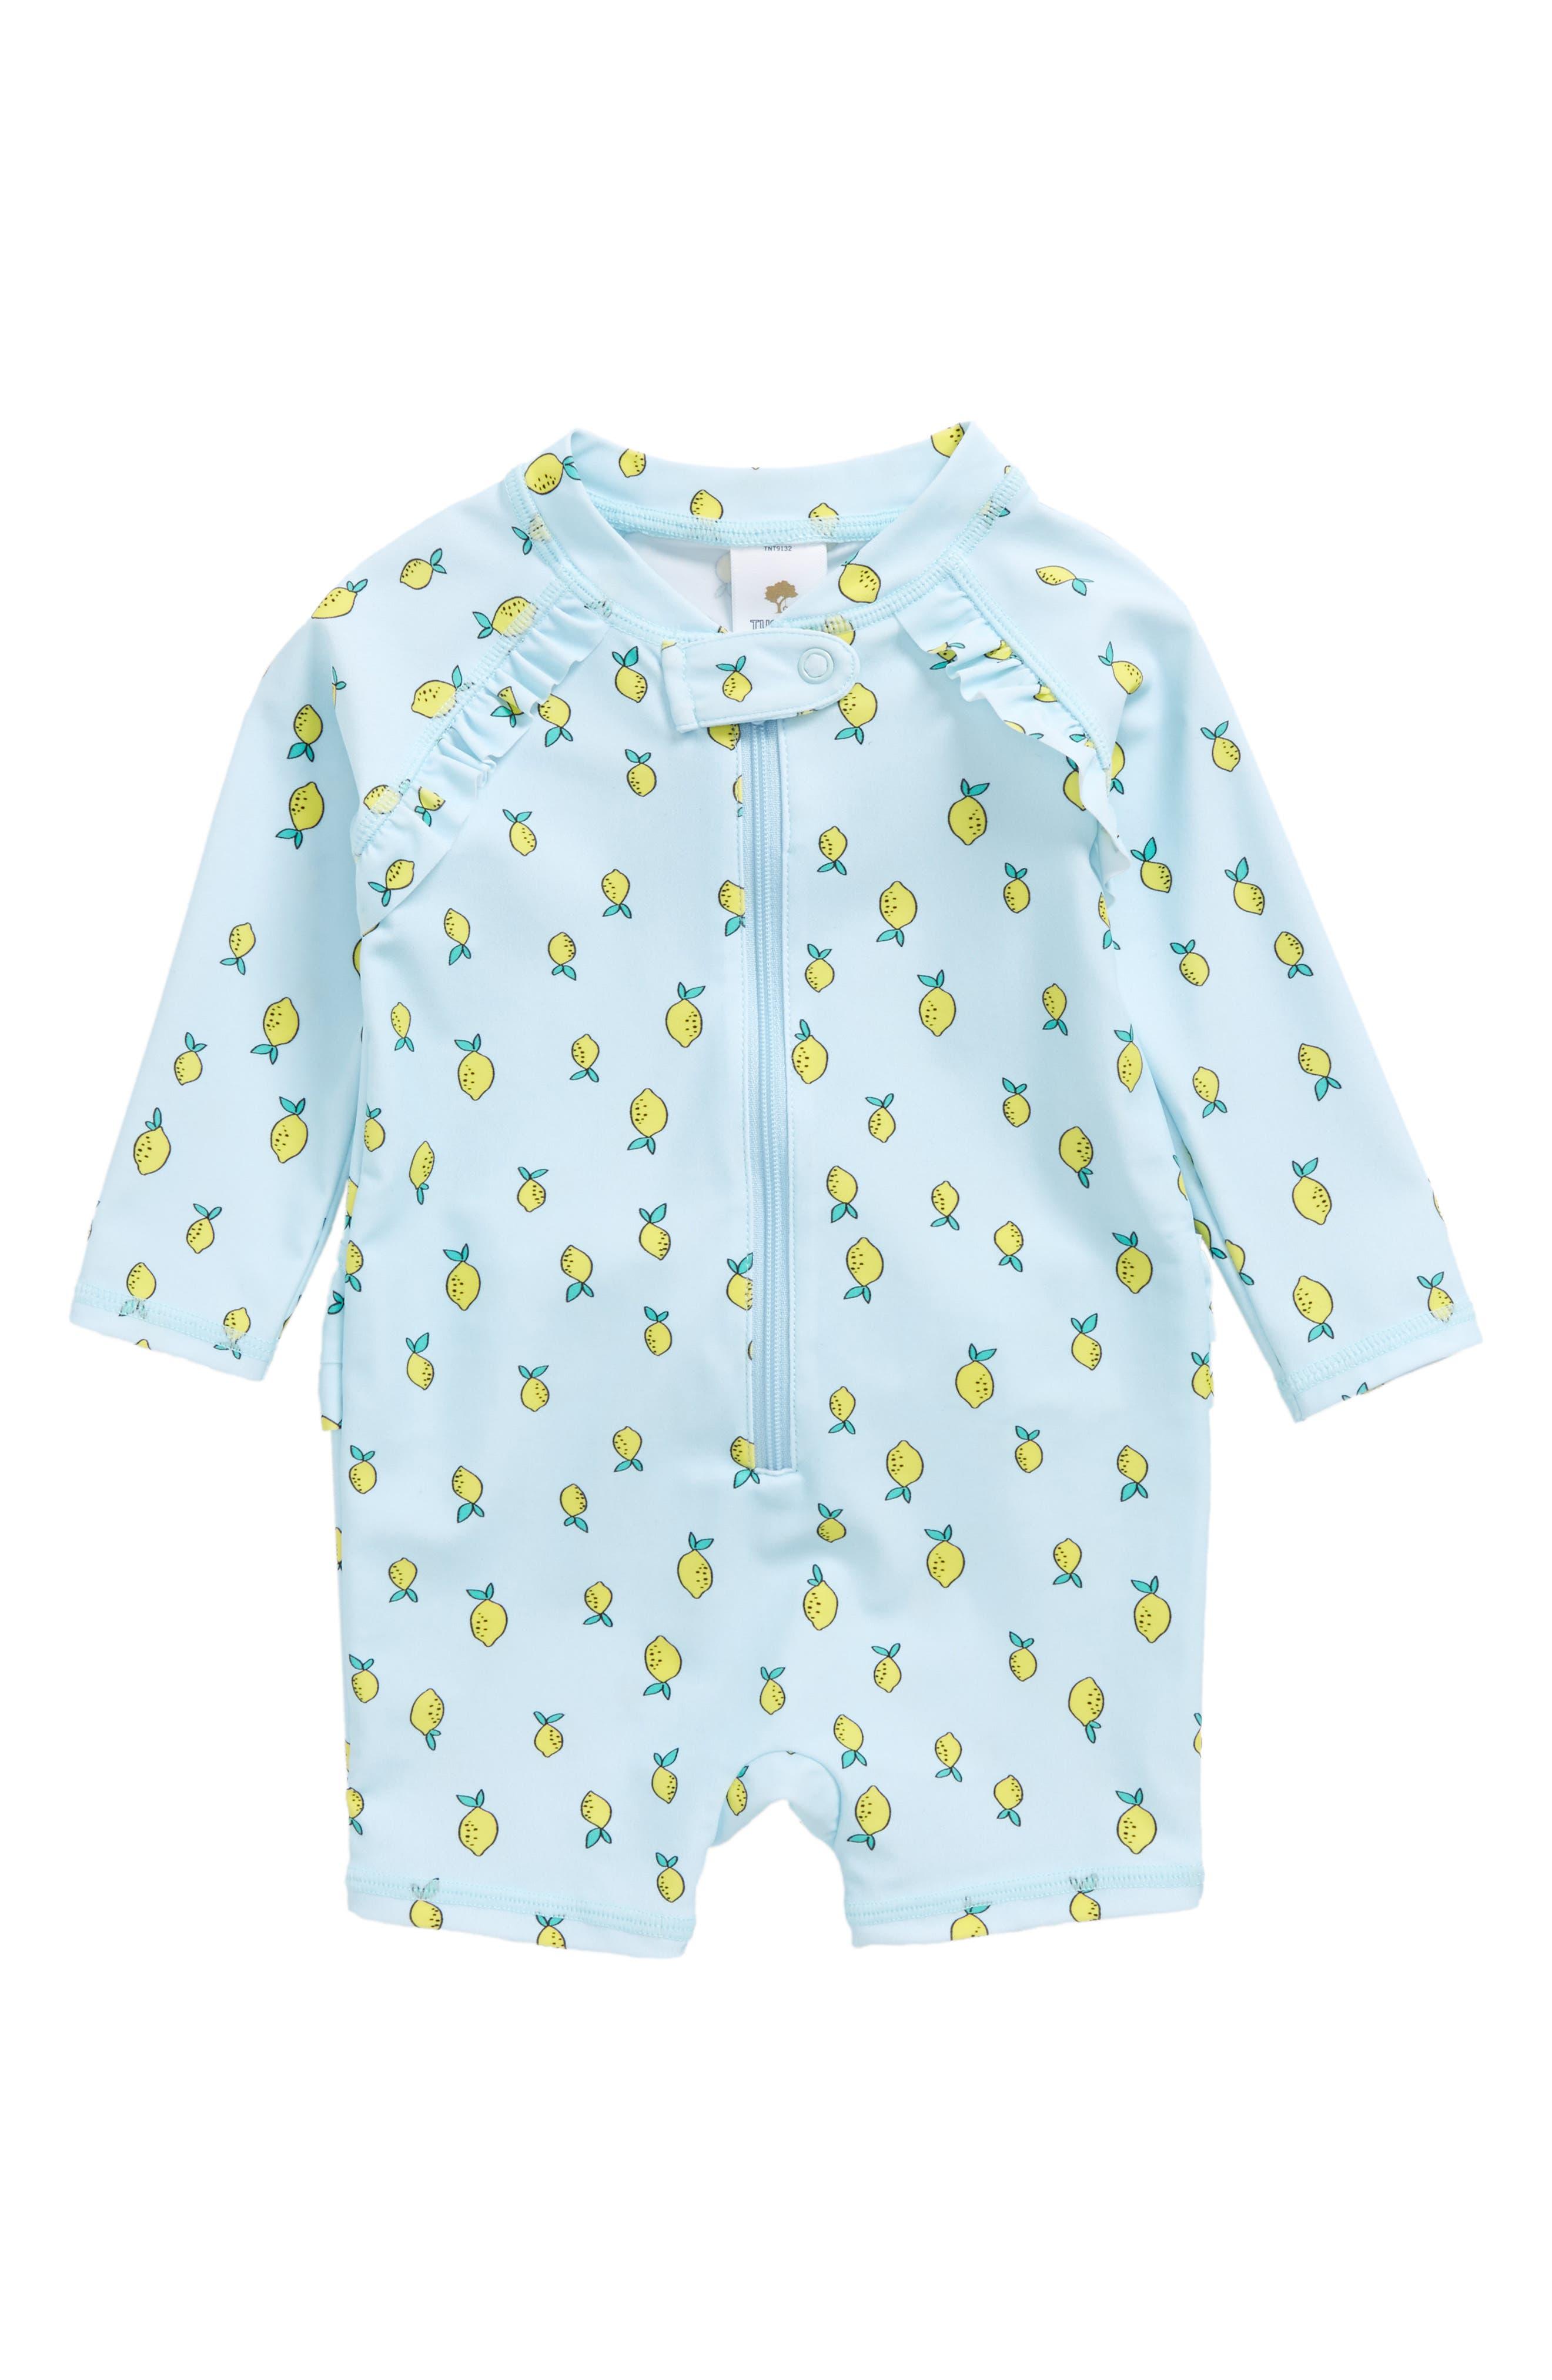 Main Image - Tucker + Tate Lemon Print One-Piece Rashguard Swimsuit (Baby Girls)